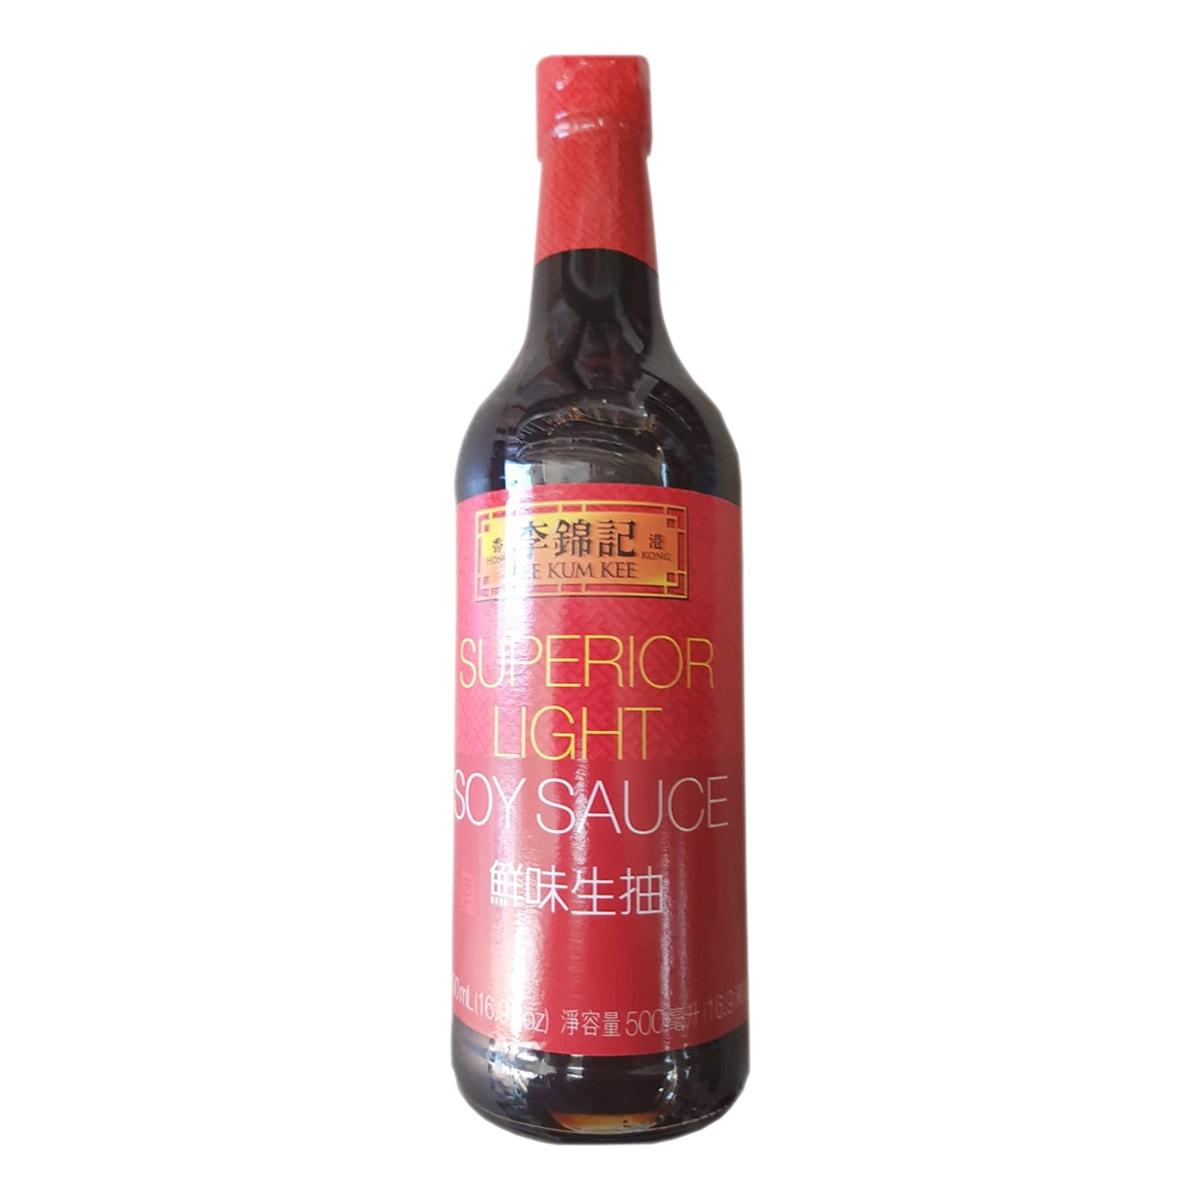 Superior Light Soy Sauce - 500 ml